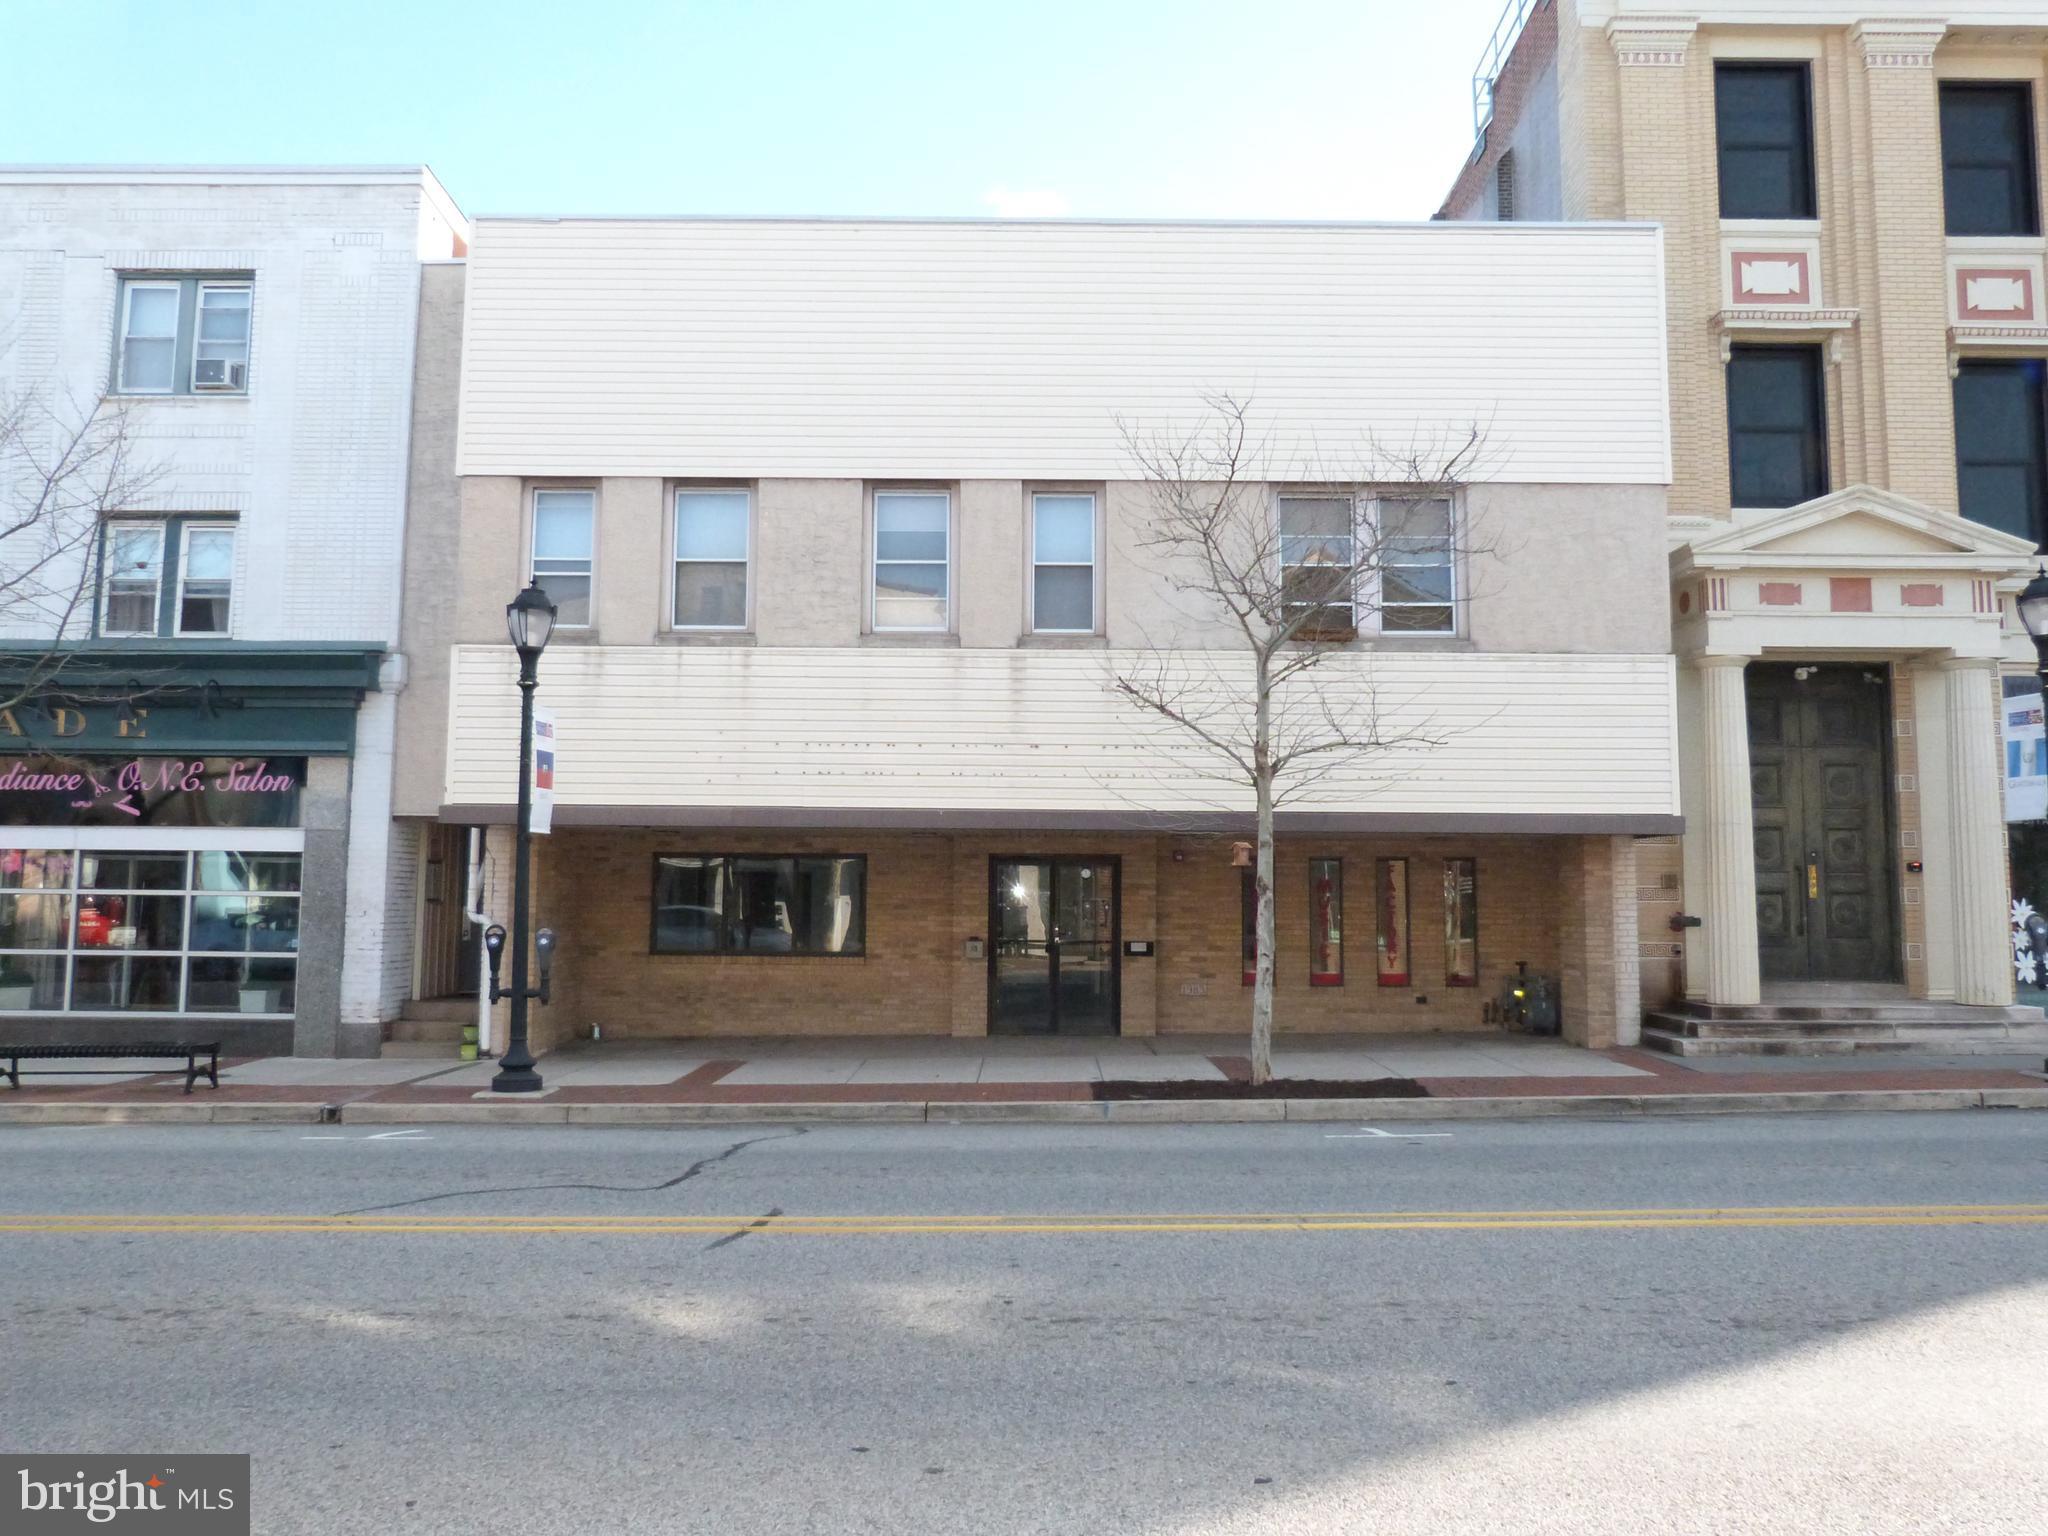 315 W MAIN STREET, LANSDALE, PA 19446